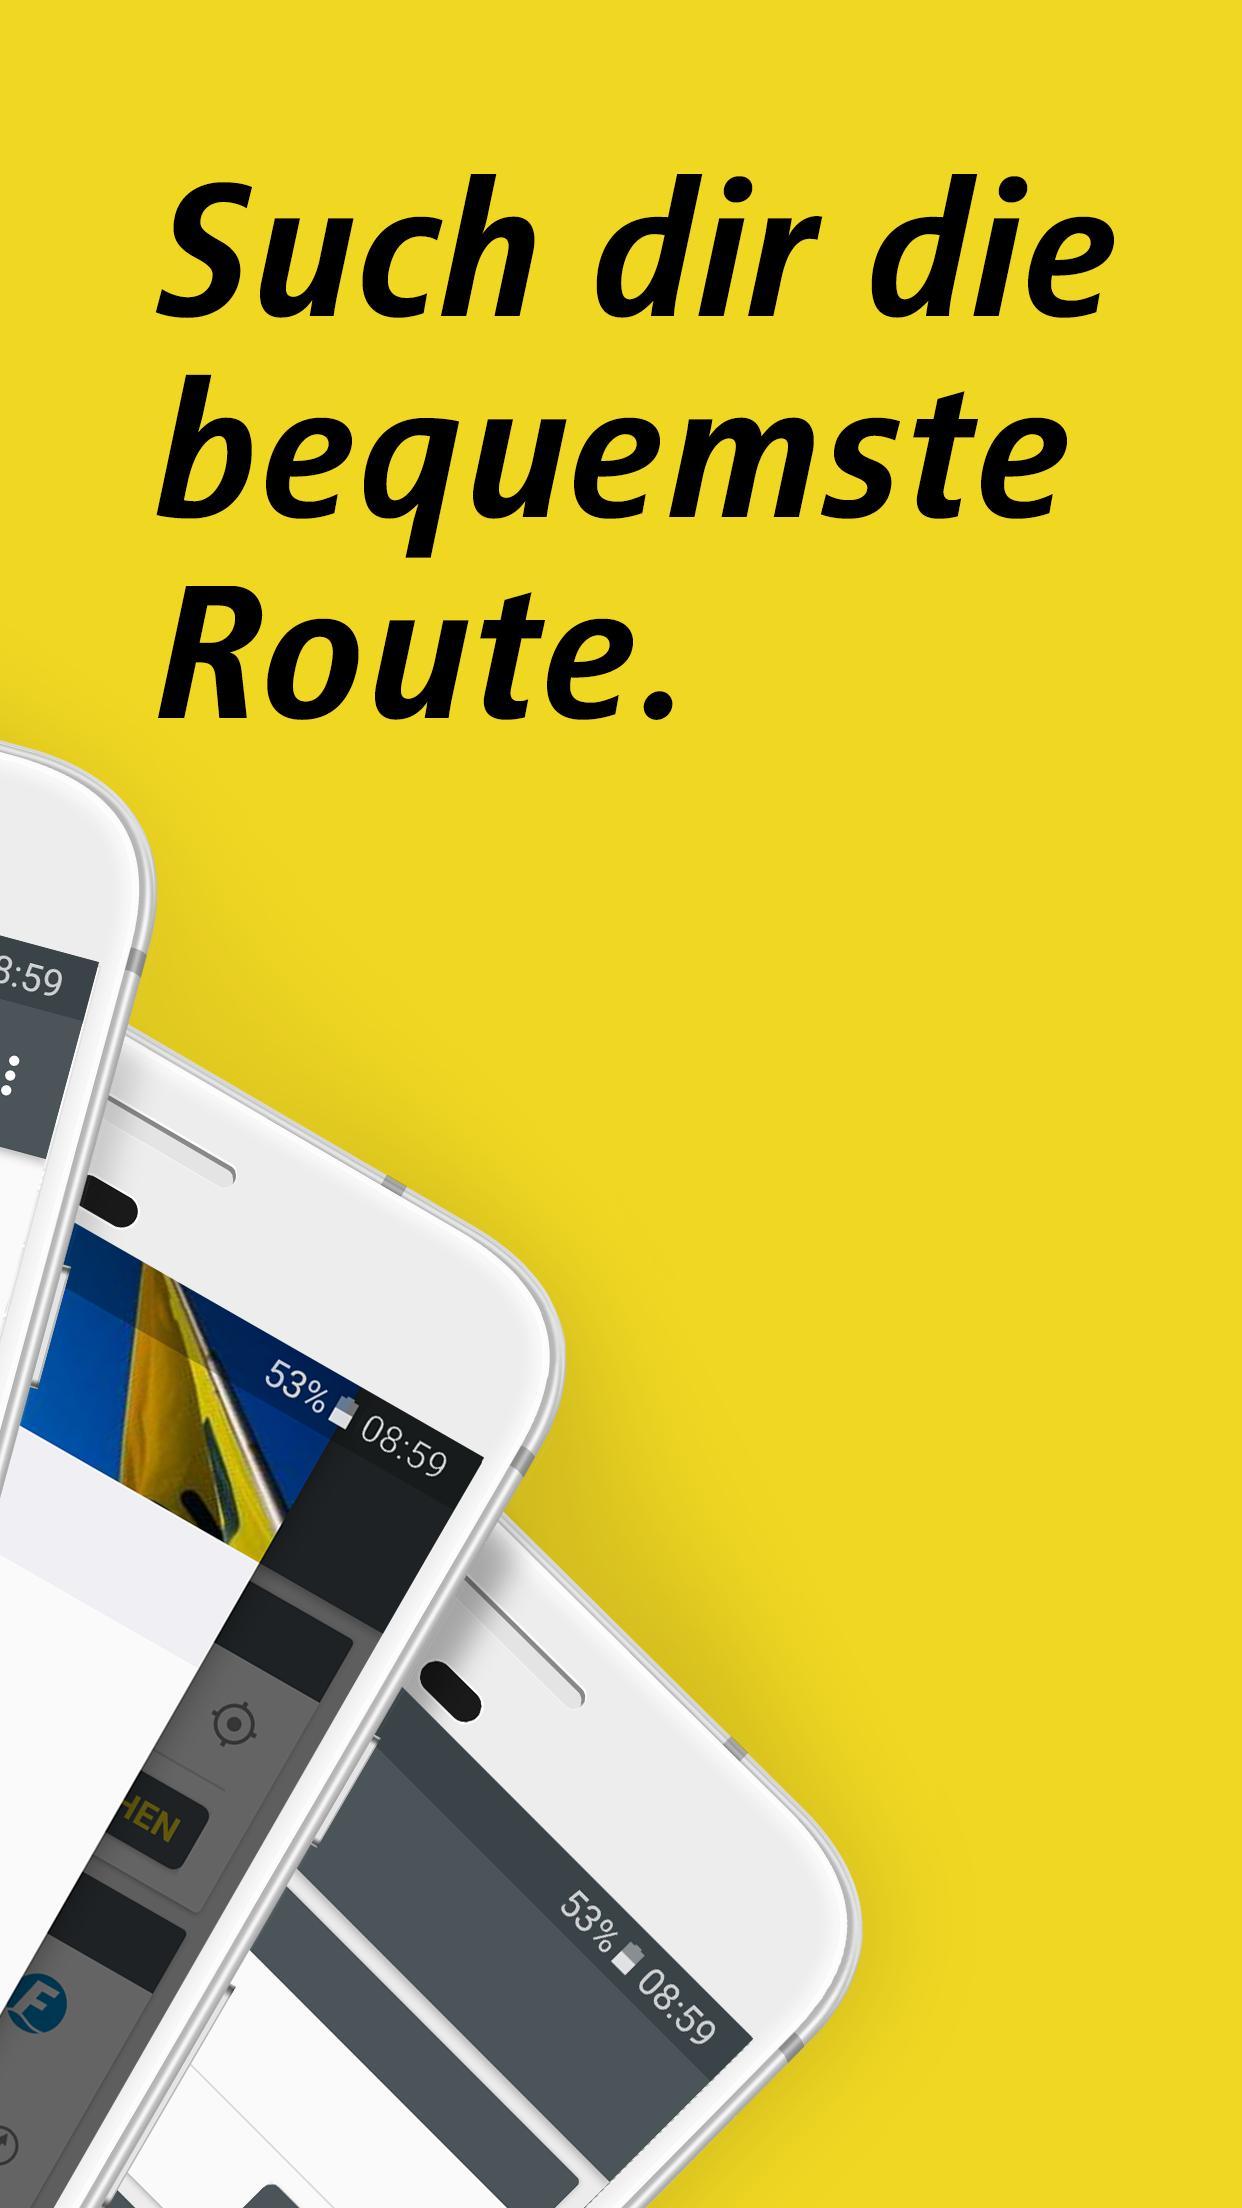 bvg fahrplanauskunft berlin